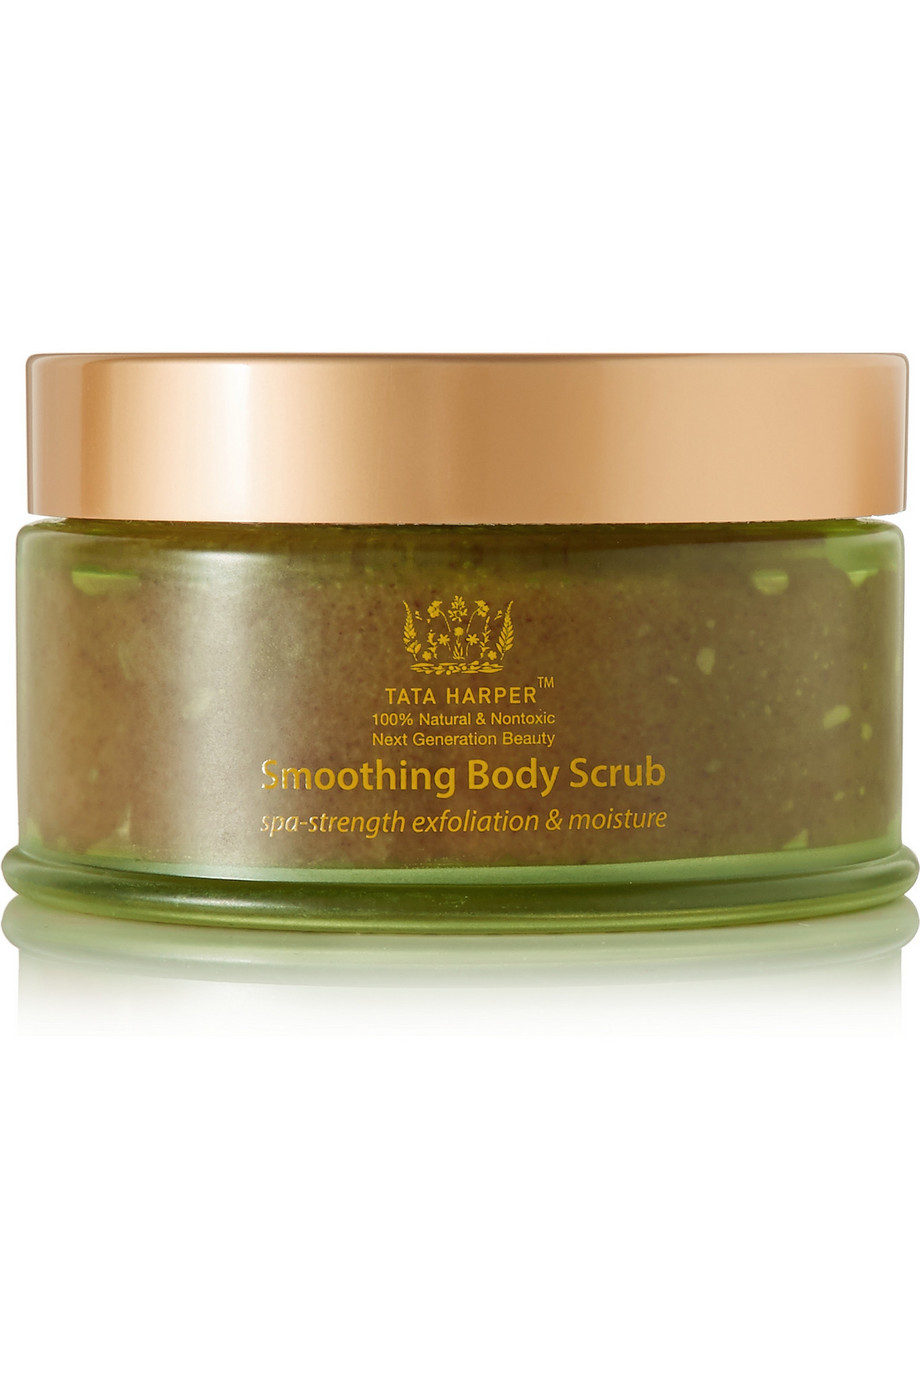 Smoothing Body Scrub, 150ml, by Tata Harper